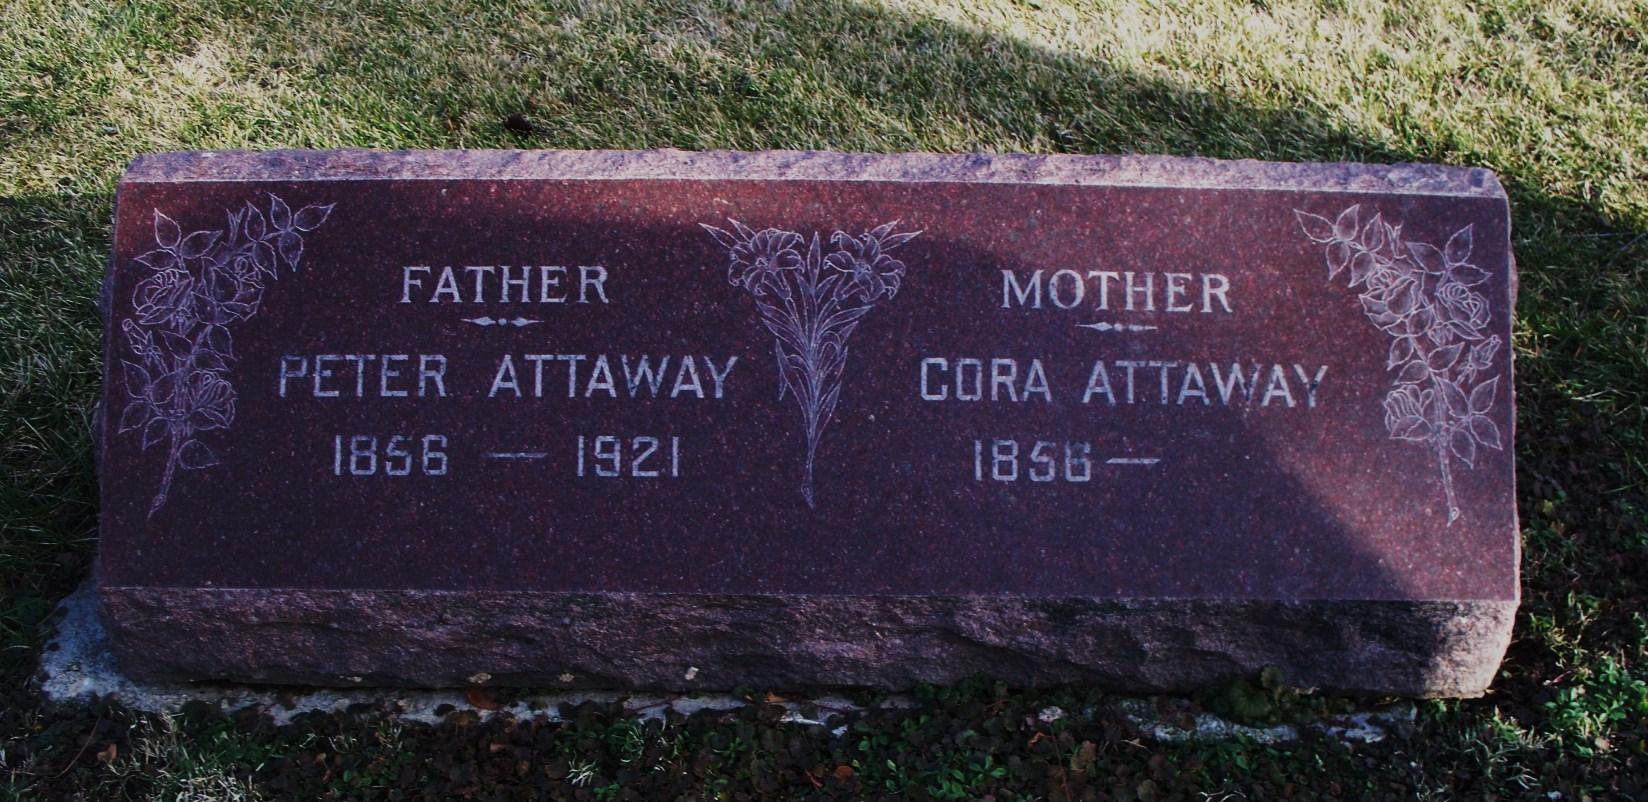 Peter Attaway